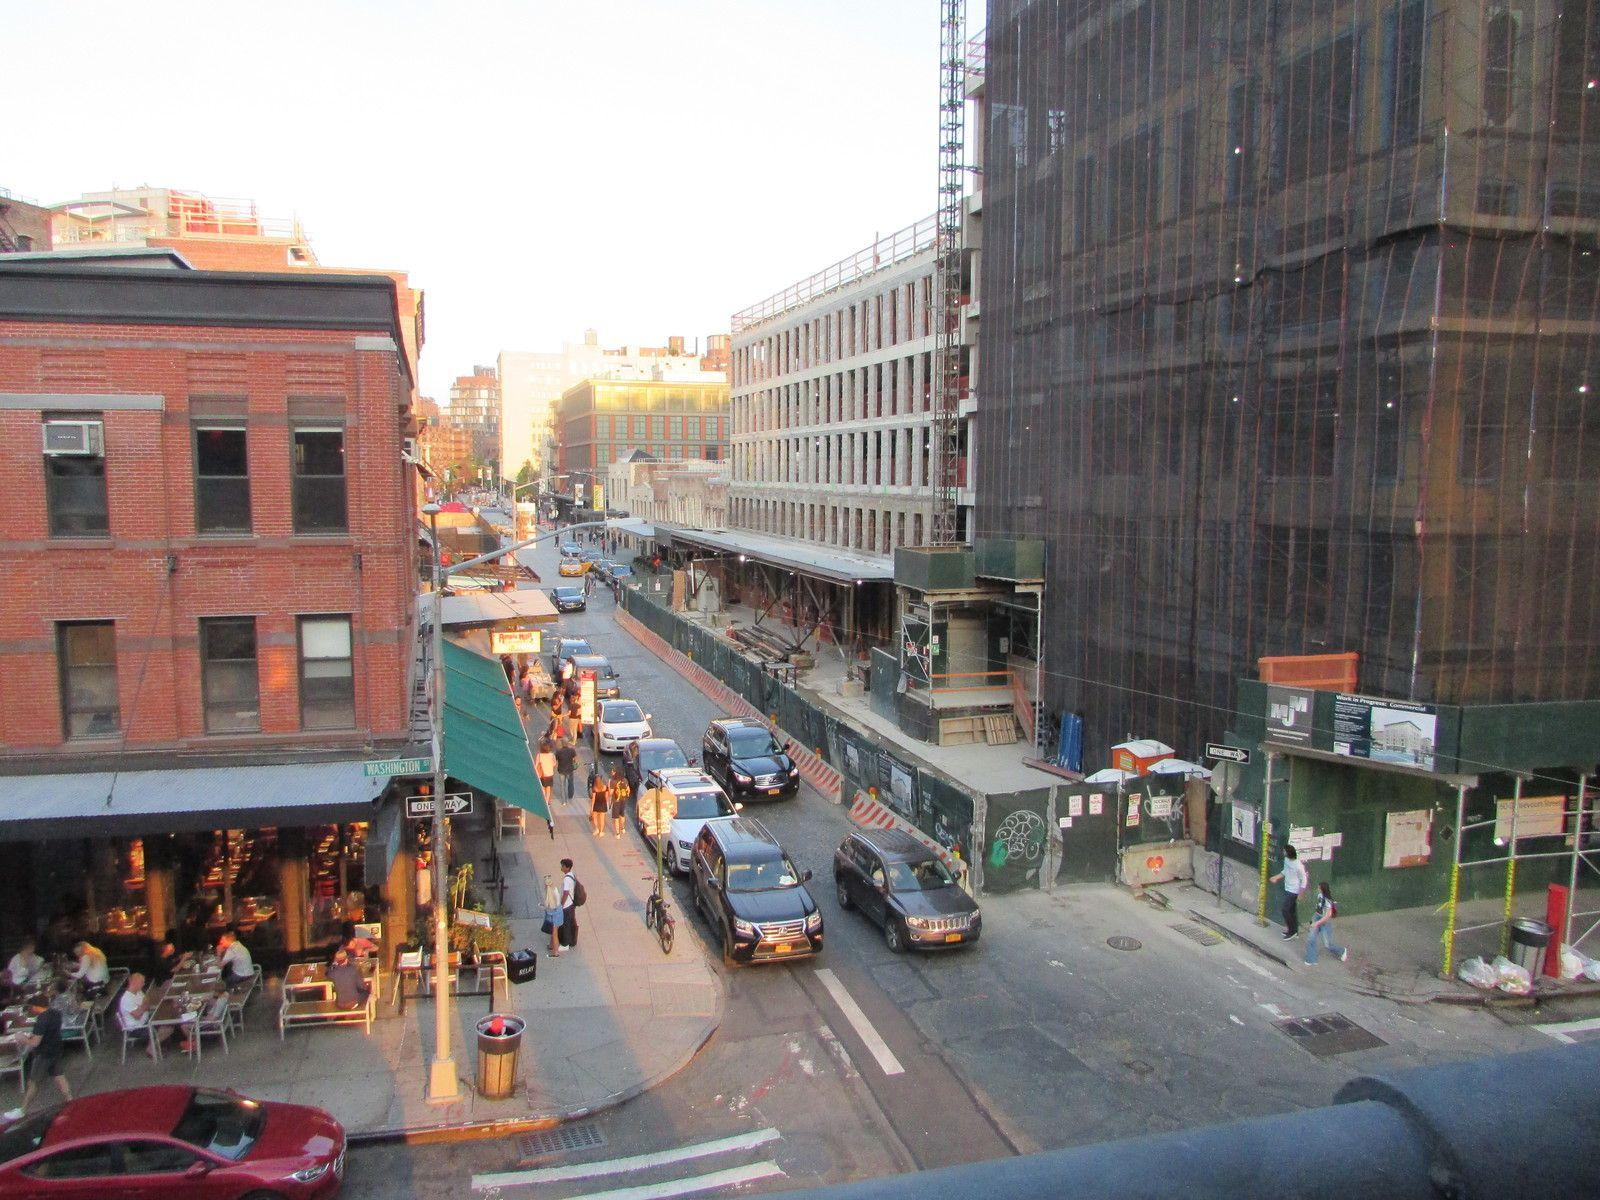 Promenade le long de la High Line.